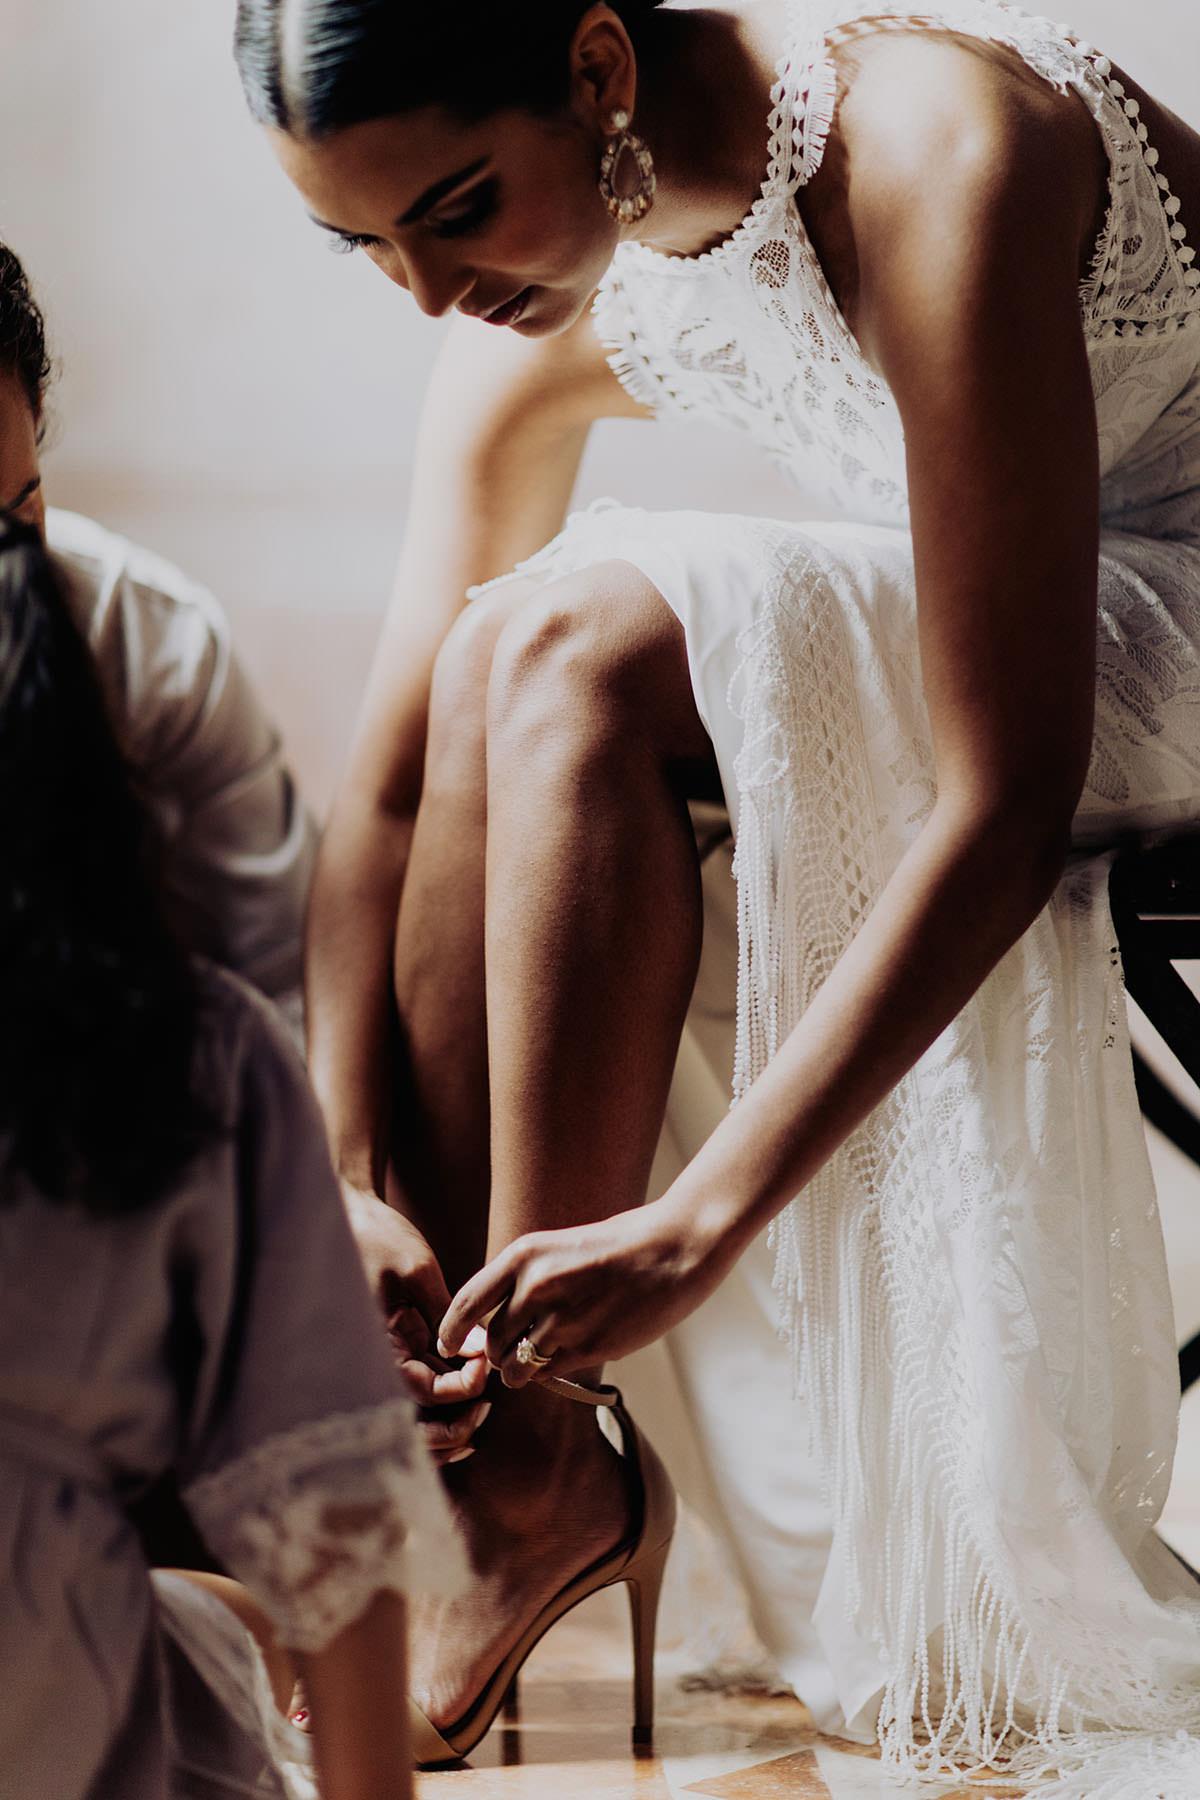 wedding-photography-destination-merida-mexico-wedding-042.jpg